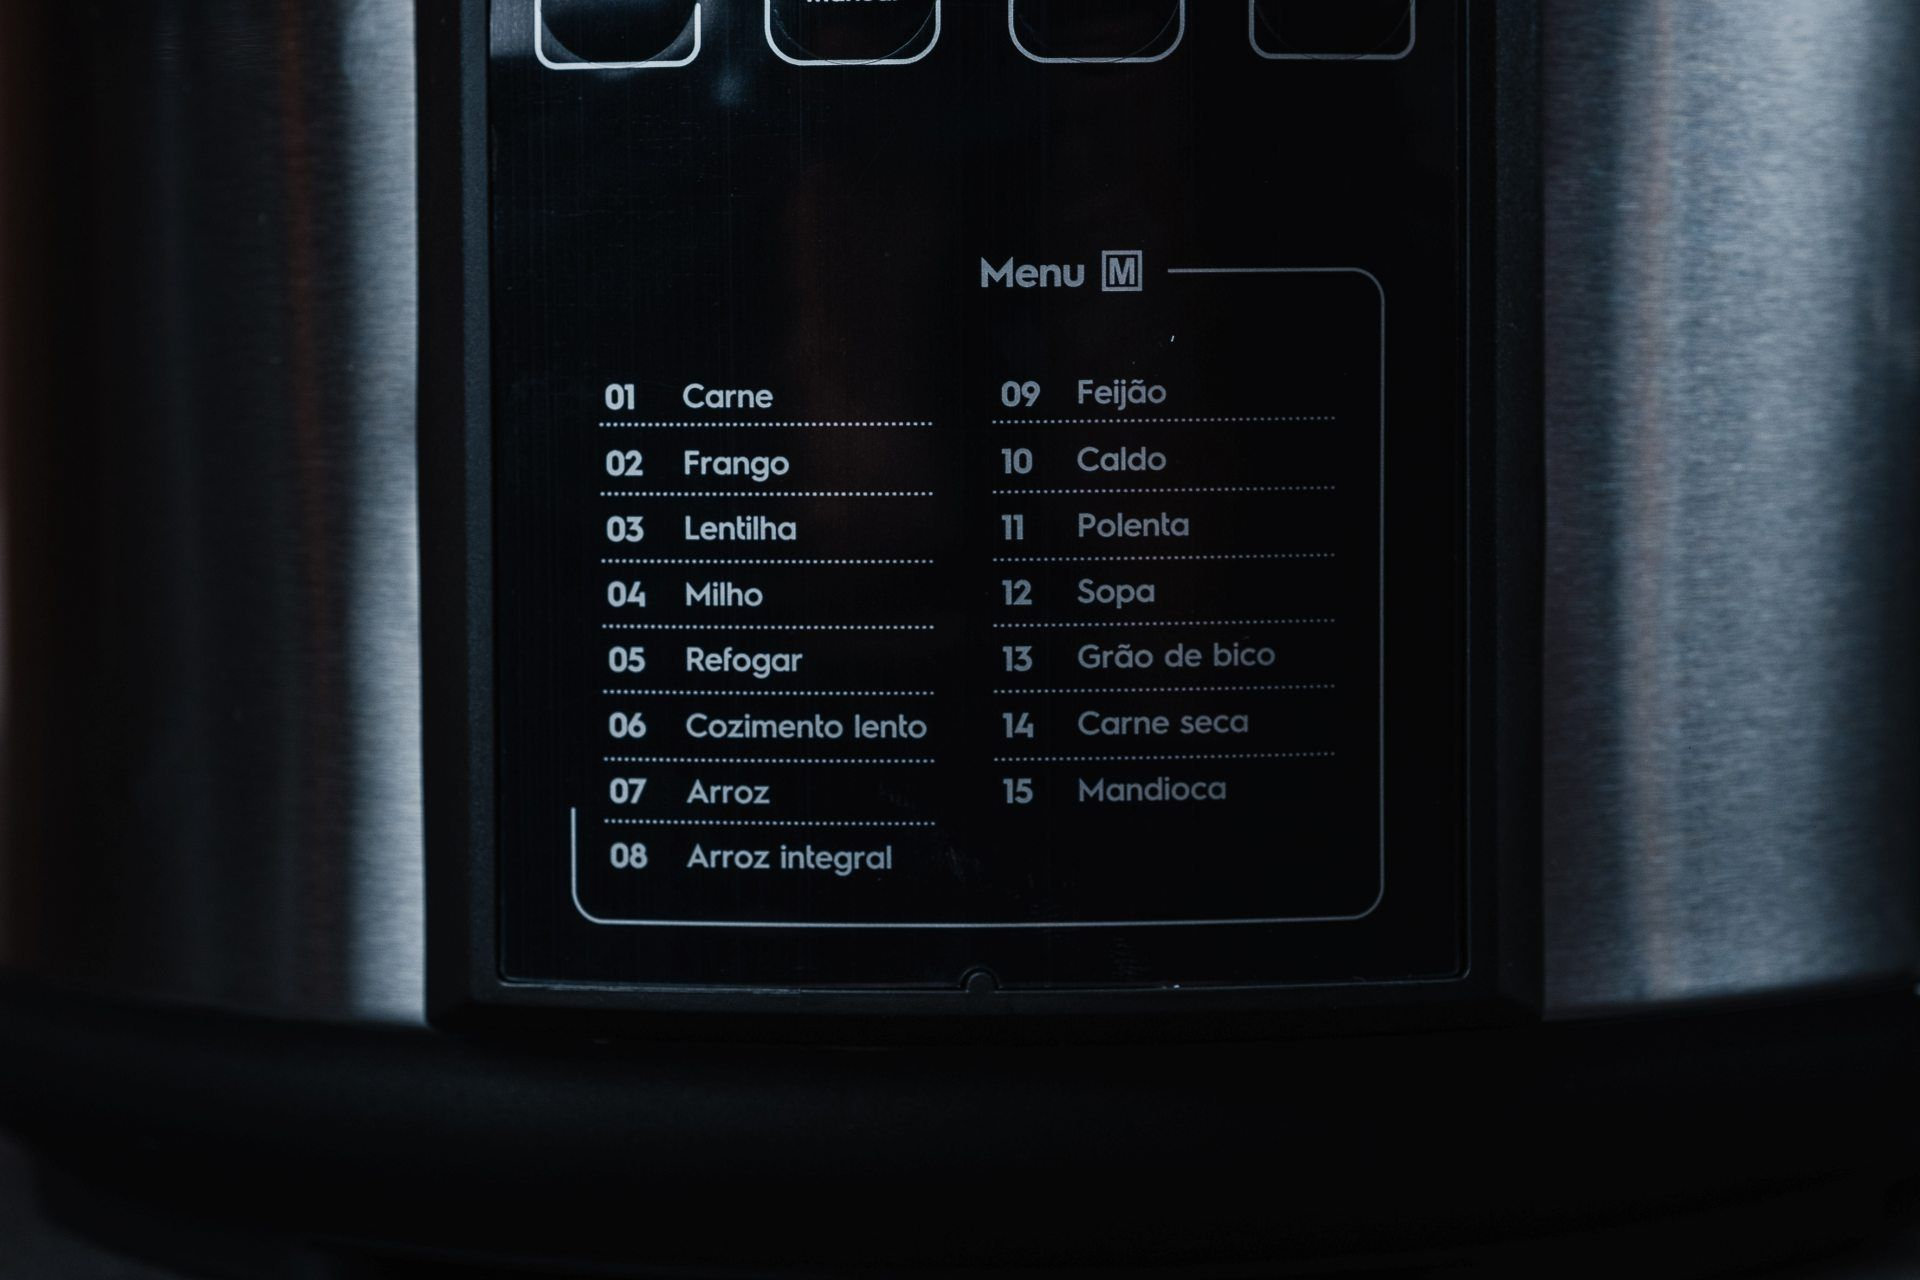 Close do painel de funções pré-programadas da Electrolux PCC20 (Foto: Zoom)